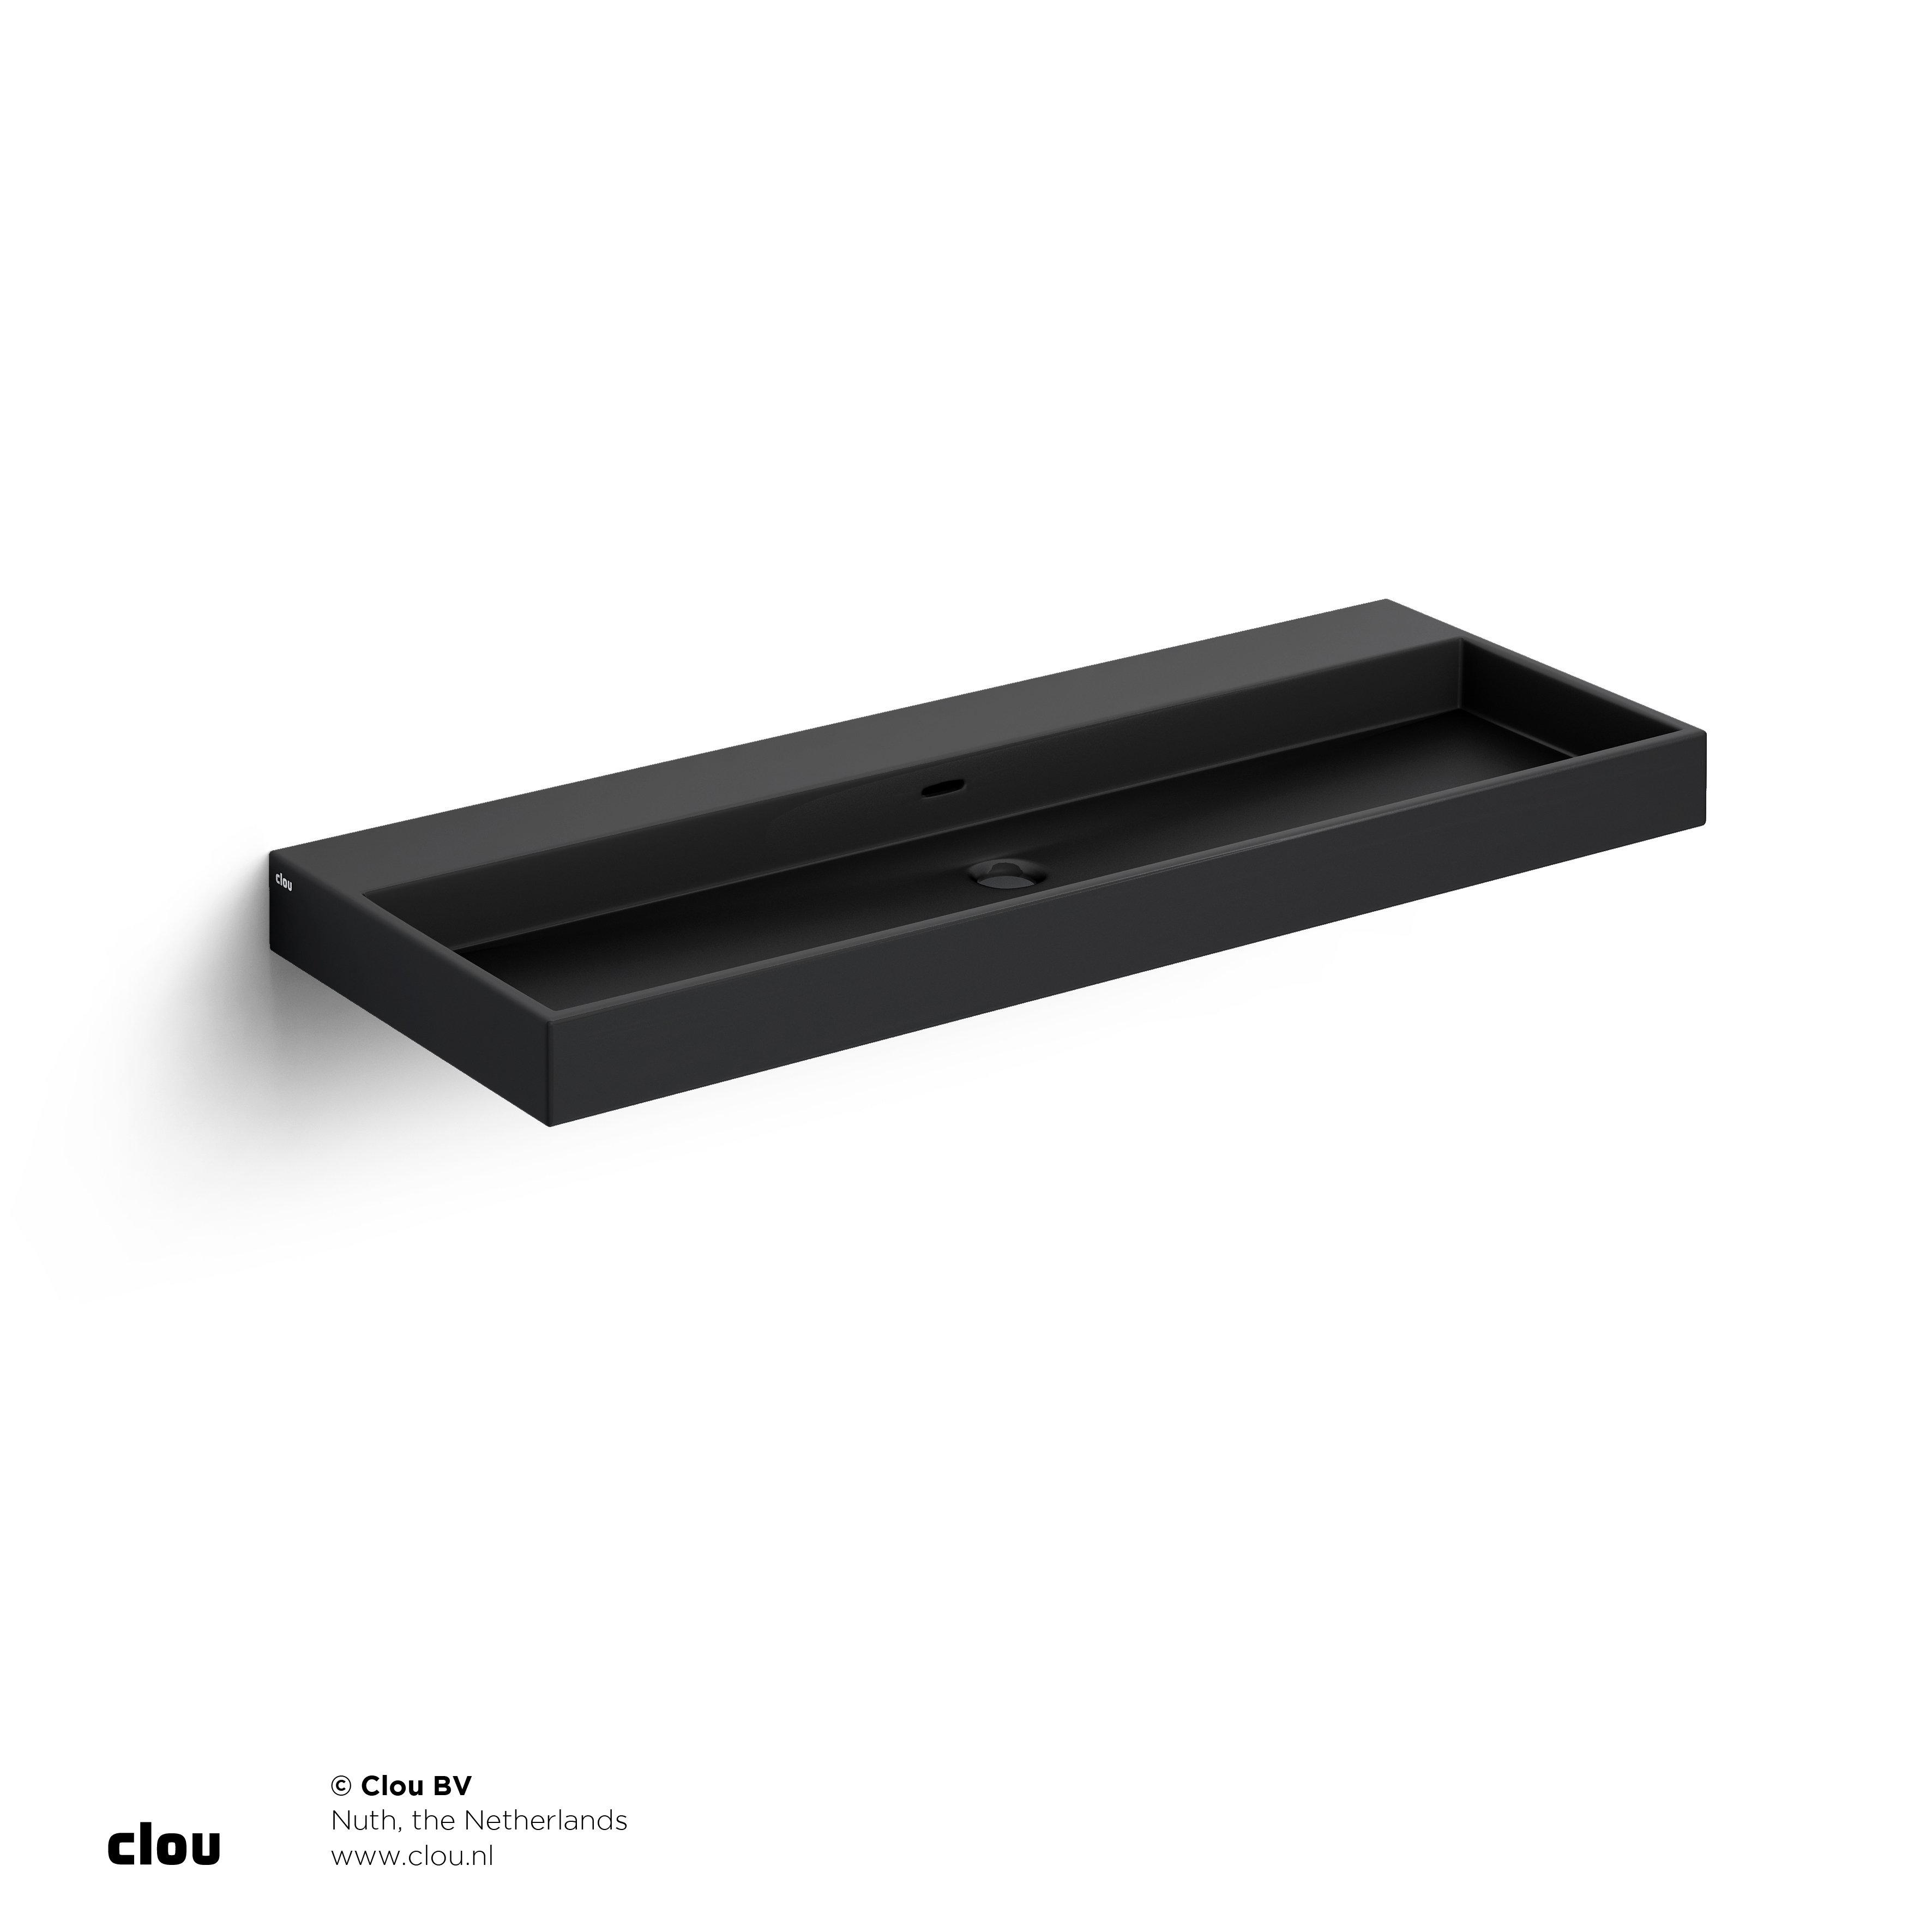 Clou Wash Me wastafel 110cm, zonder plug, mat zwart keramiek